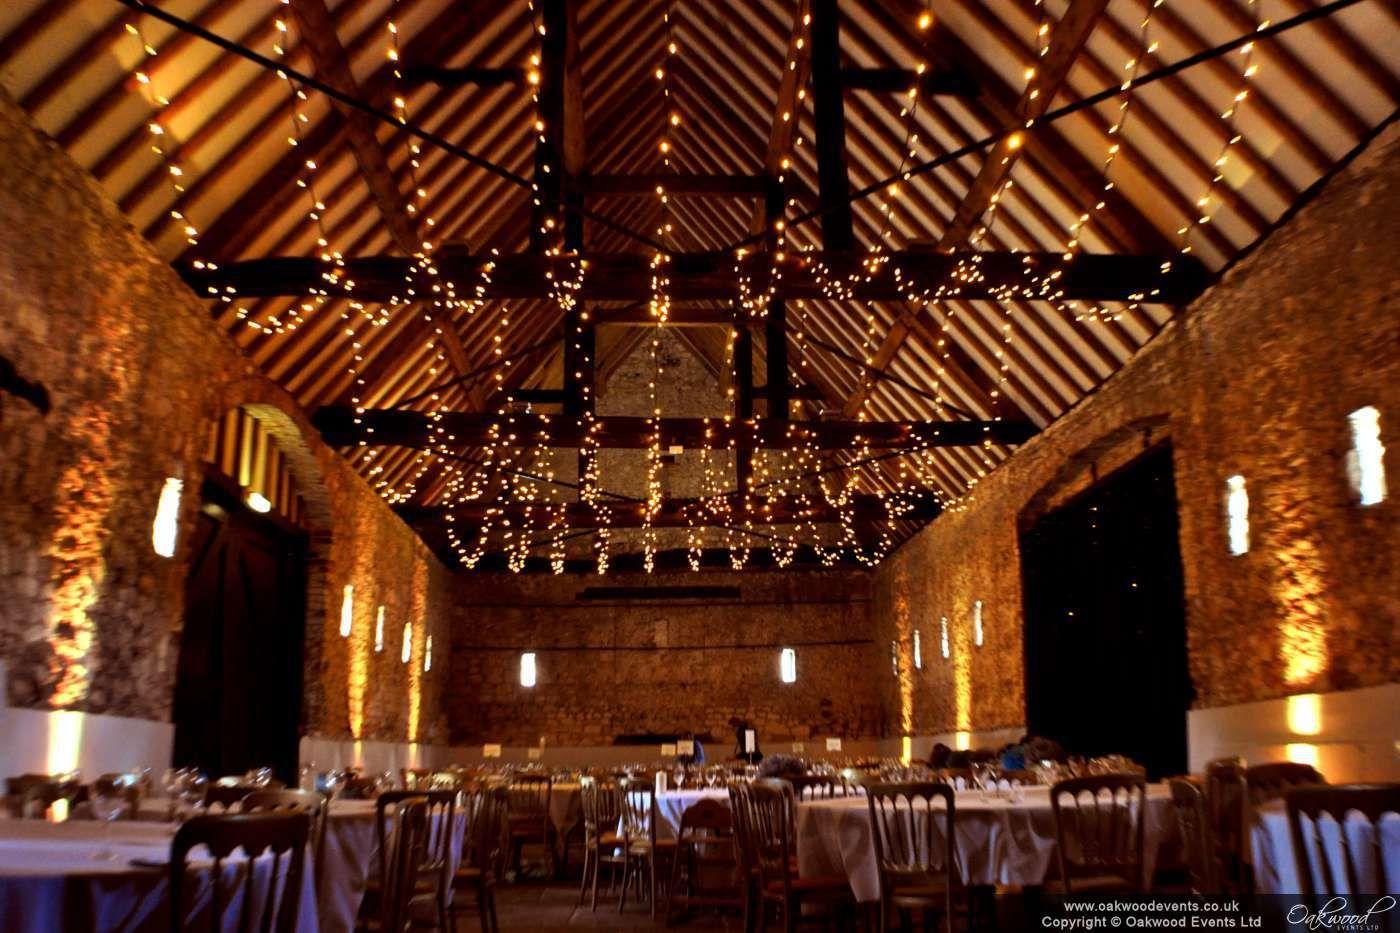 Fairy Light Ceiling: Barn Fairy Light Ceiling with Gold Uplighting,Lighting